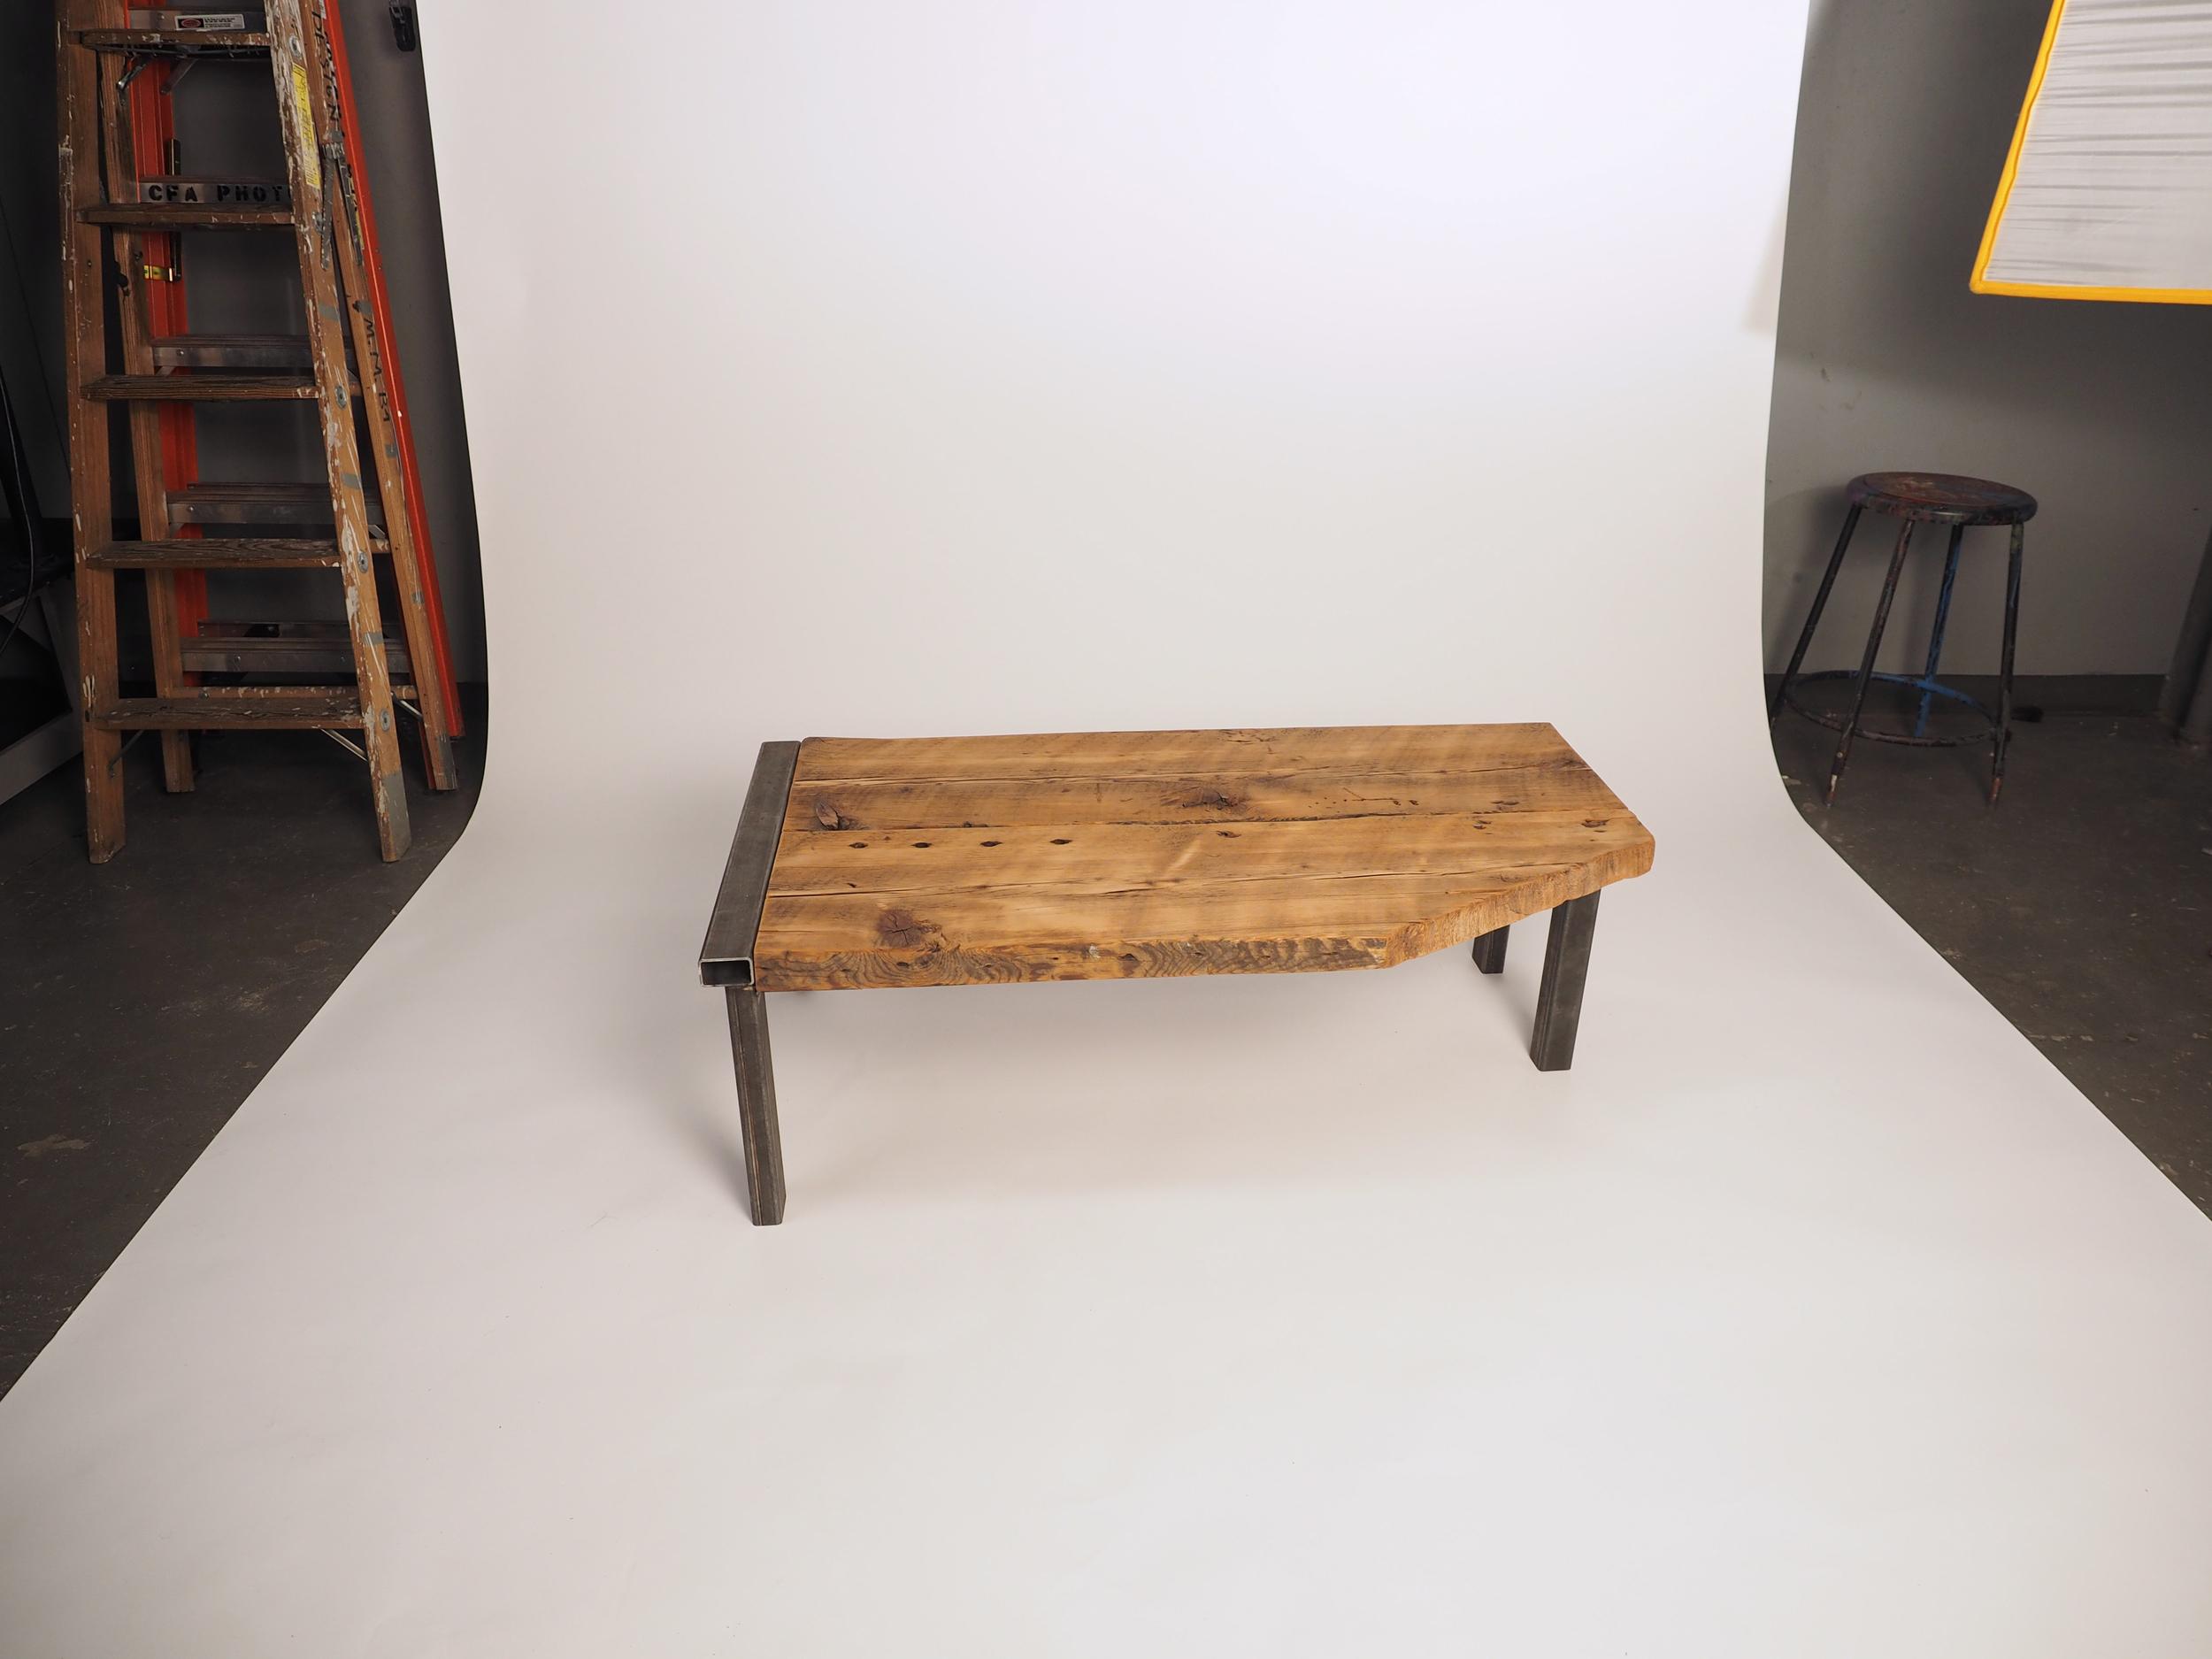 Table_06.jpg